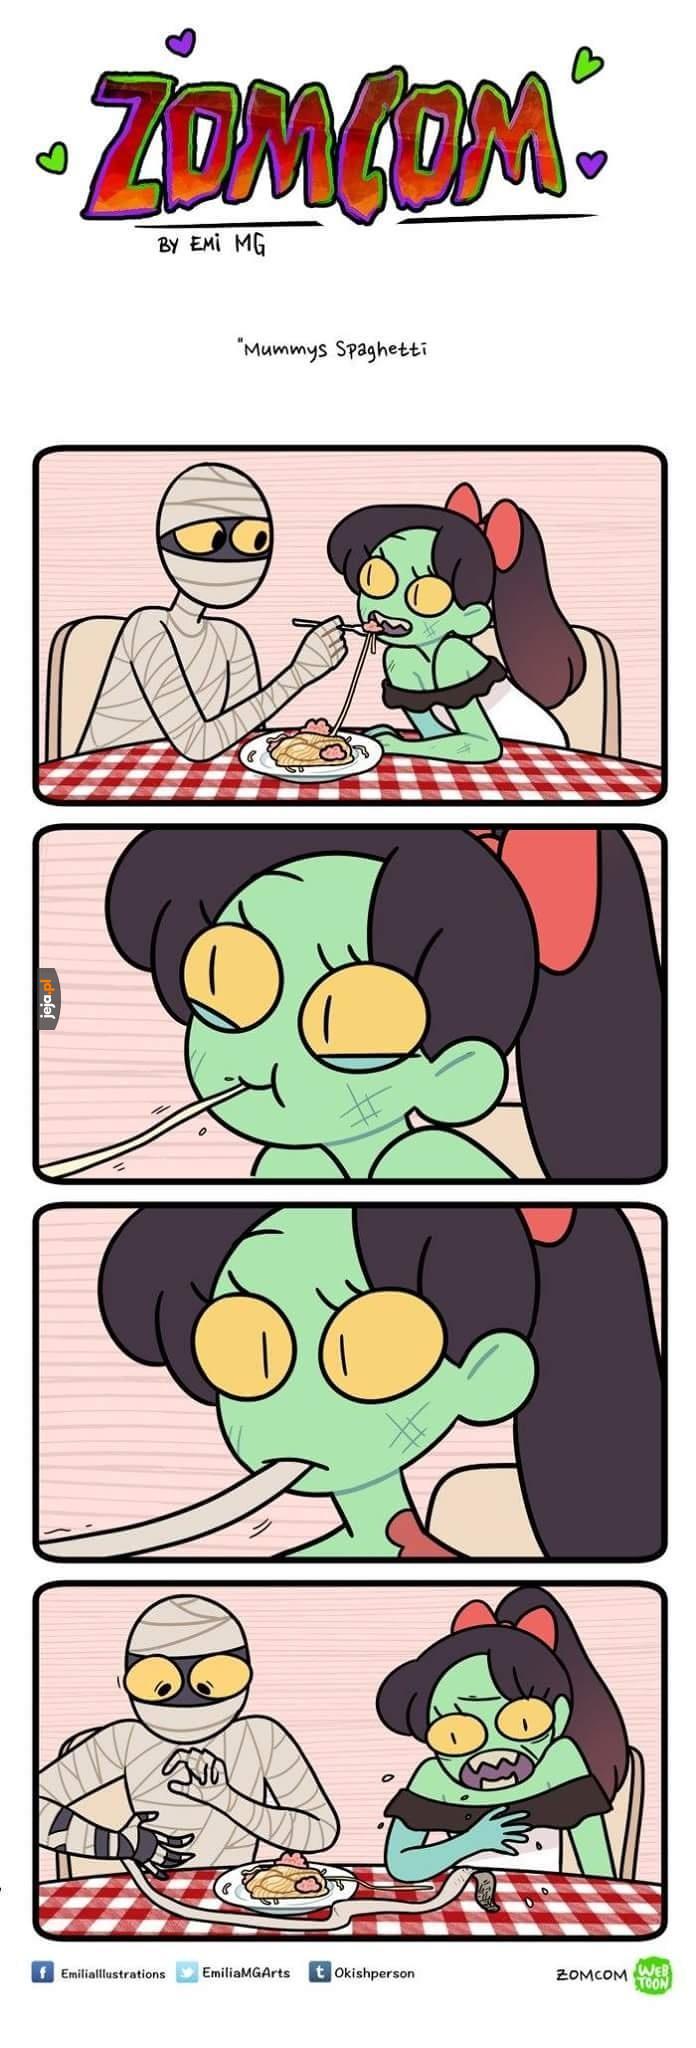 Mummys spaghetti, never forghetti